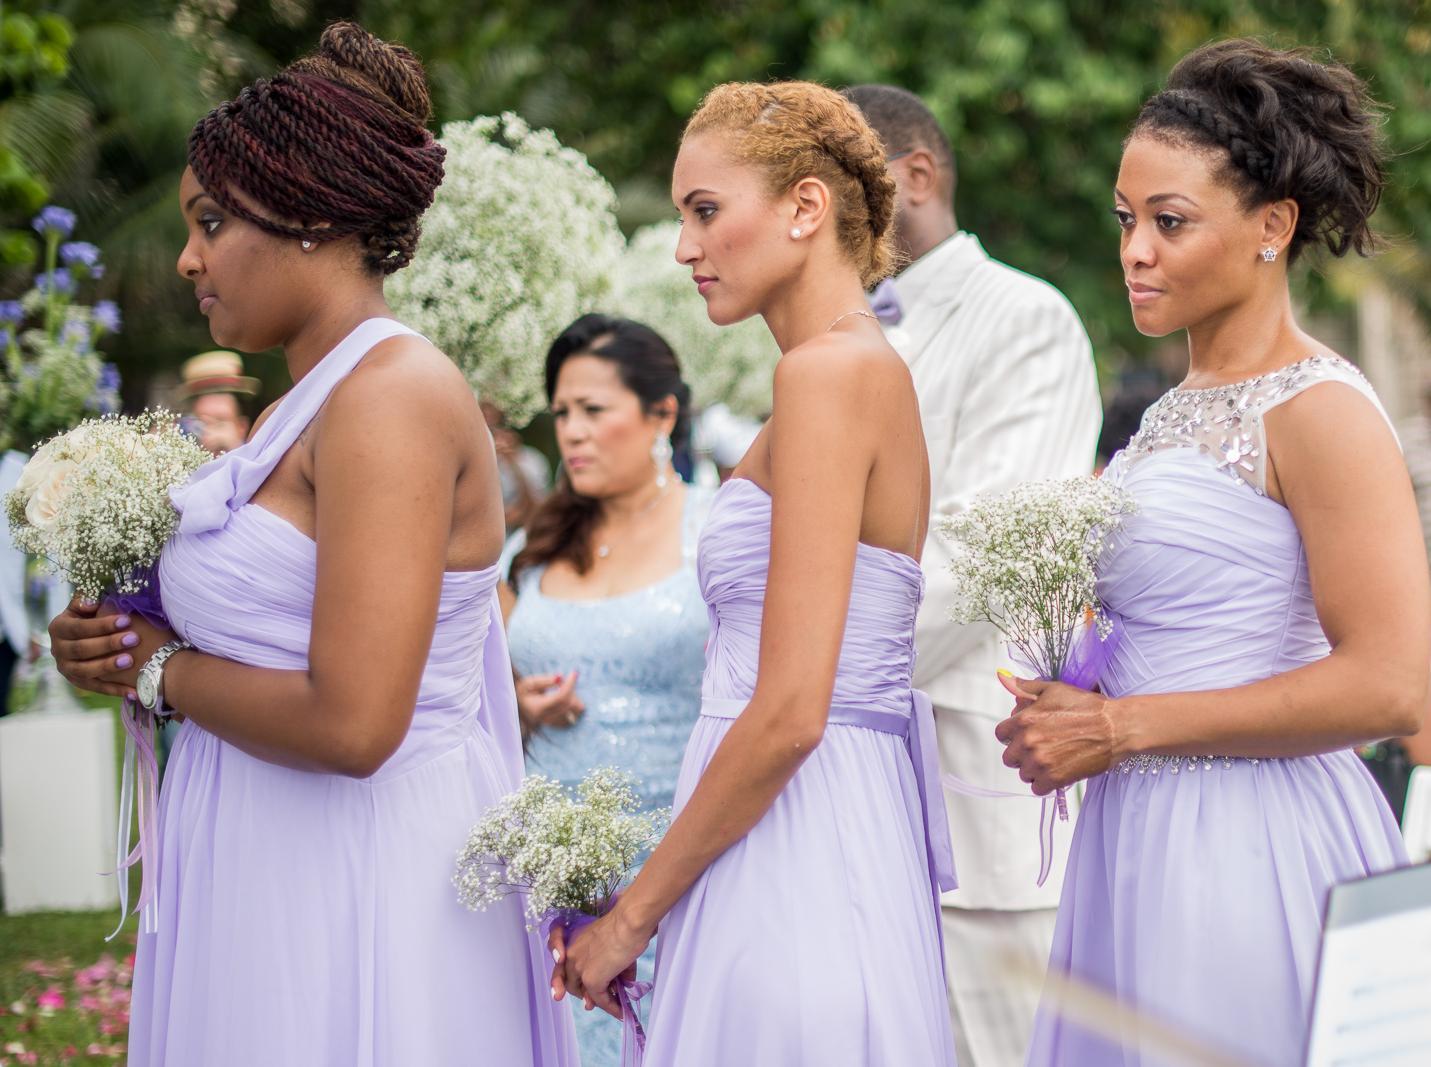 bodas-estilo-libre-jardin-cuba-9482.jpg